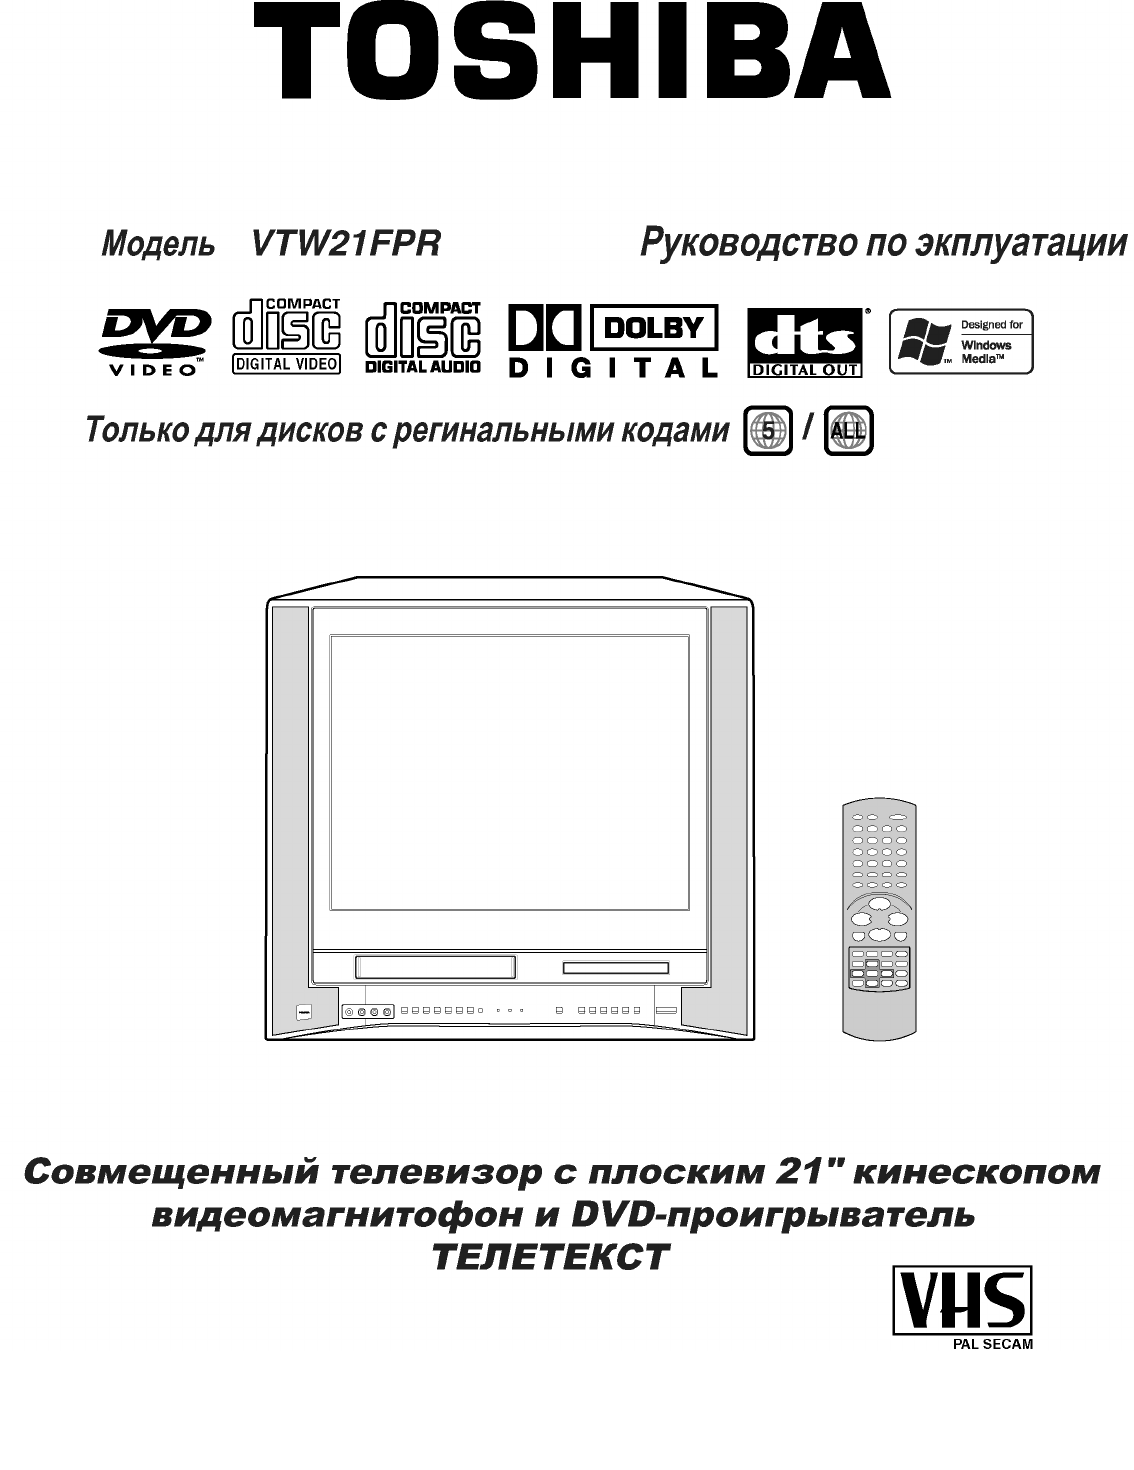 Toshiba Tv 218x8m Schematic Diagram